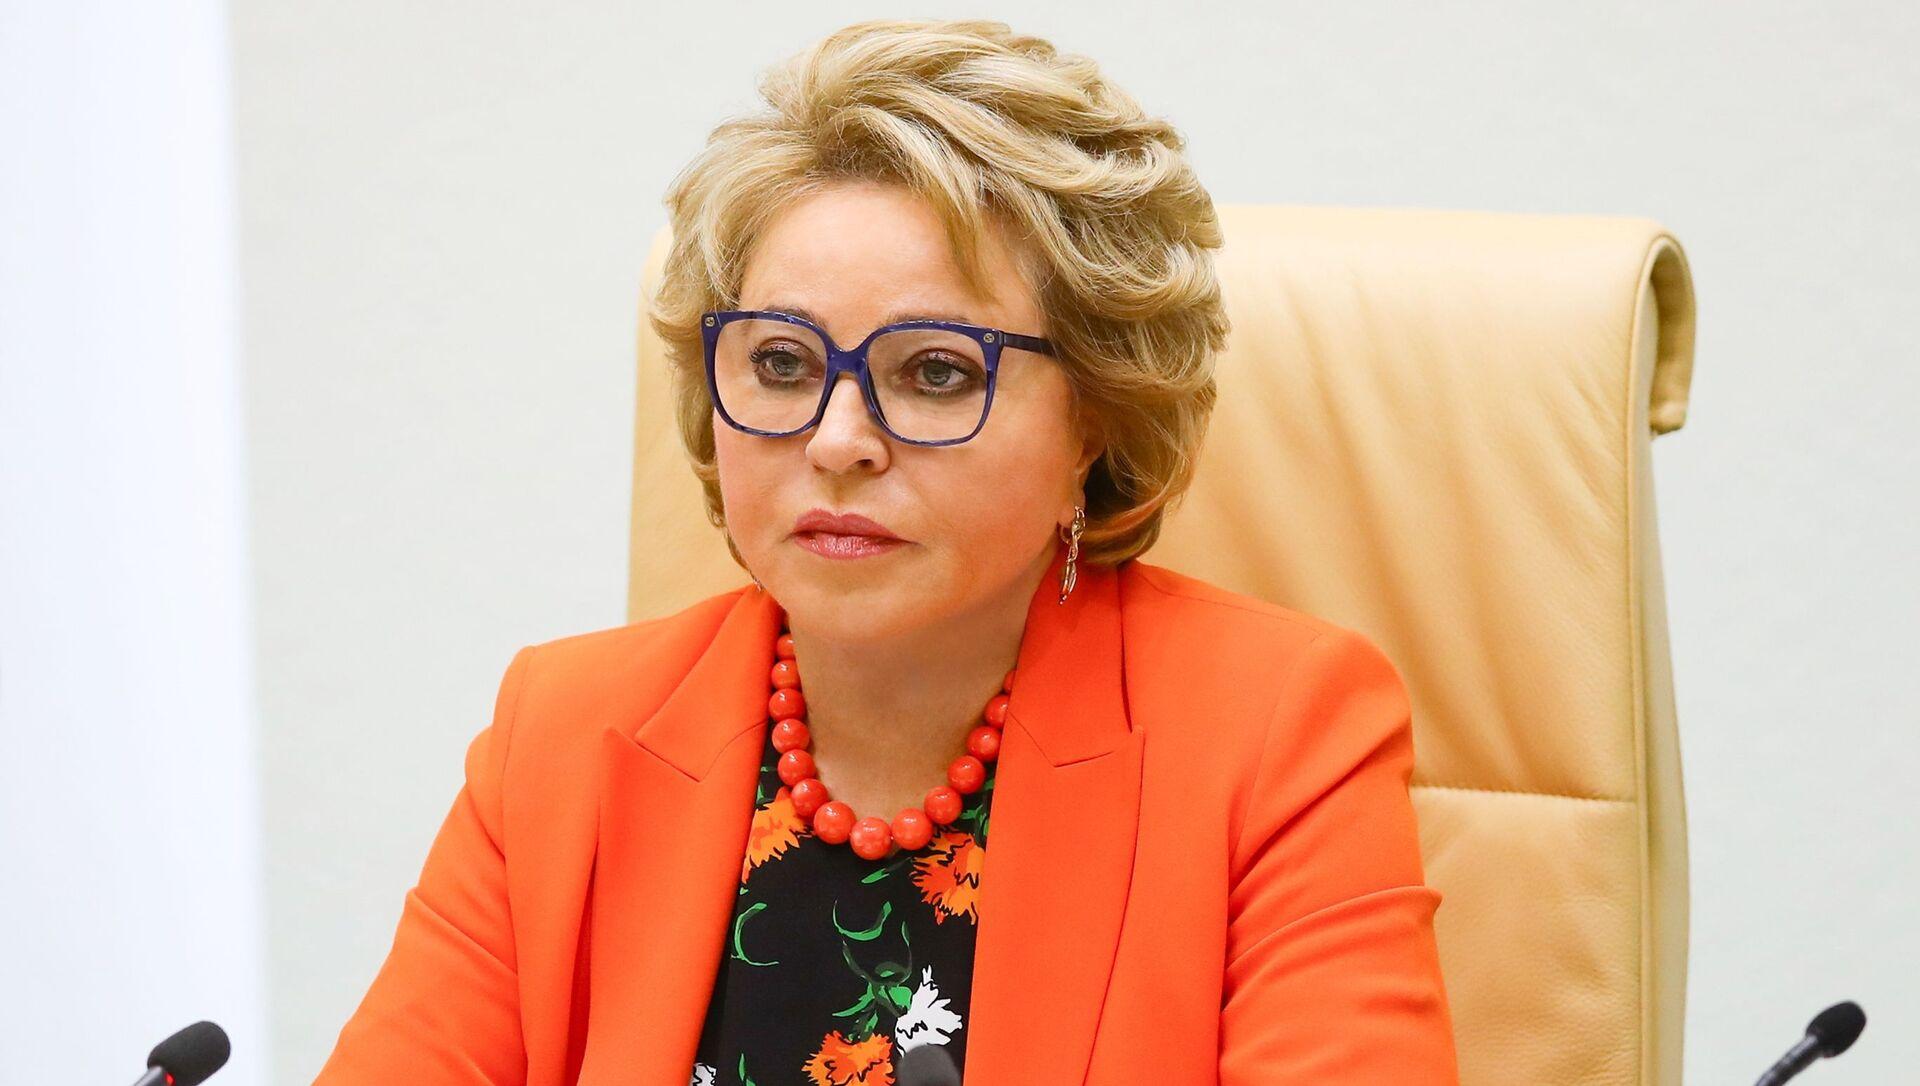 Председатель Совета Федерации Валентина Матвиенко - Sputnik Беларусь, 1920, 02.03.2021